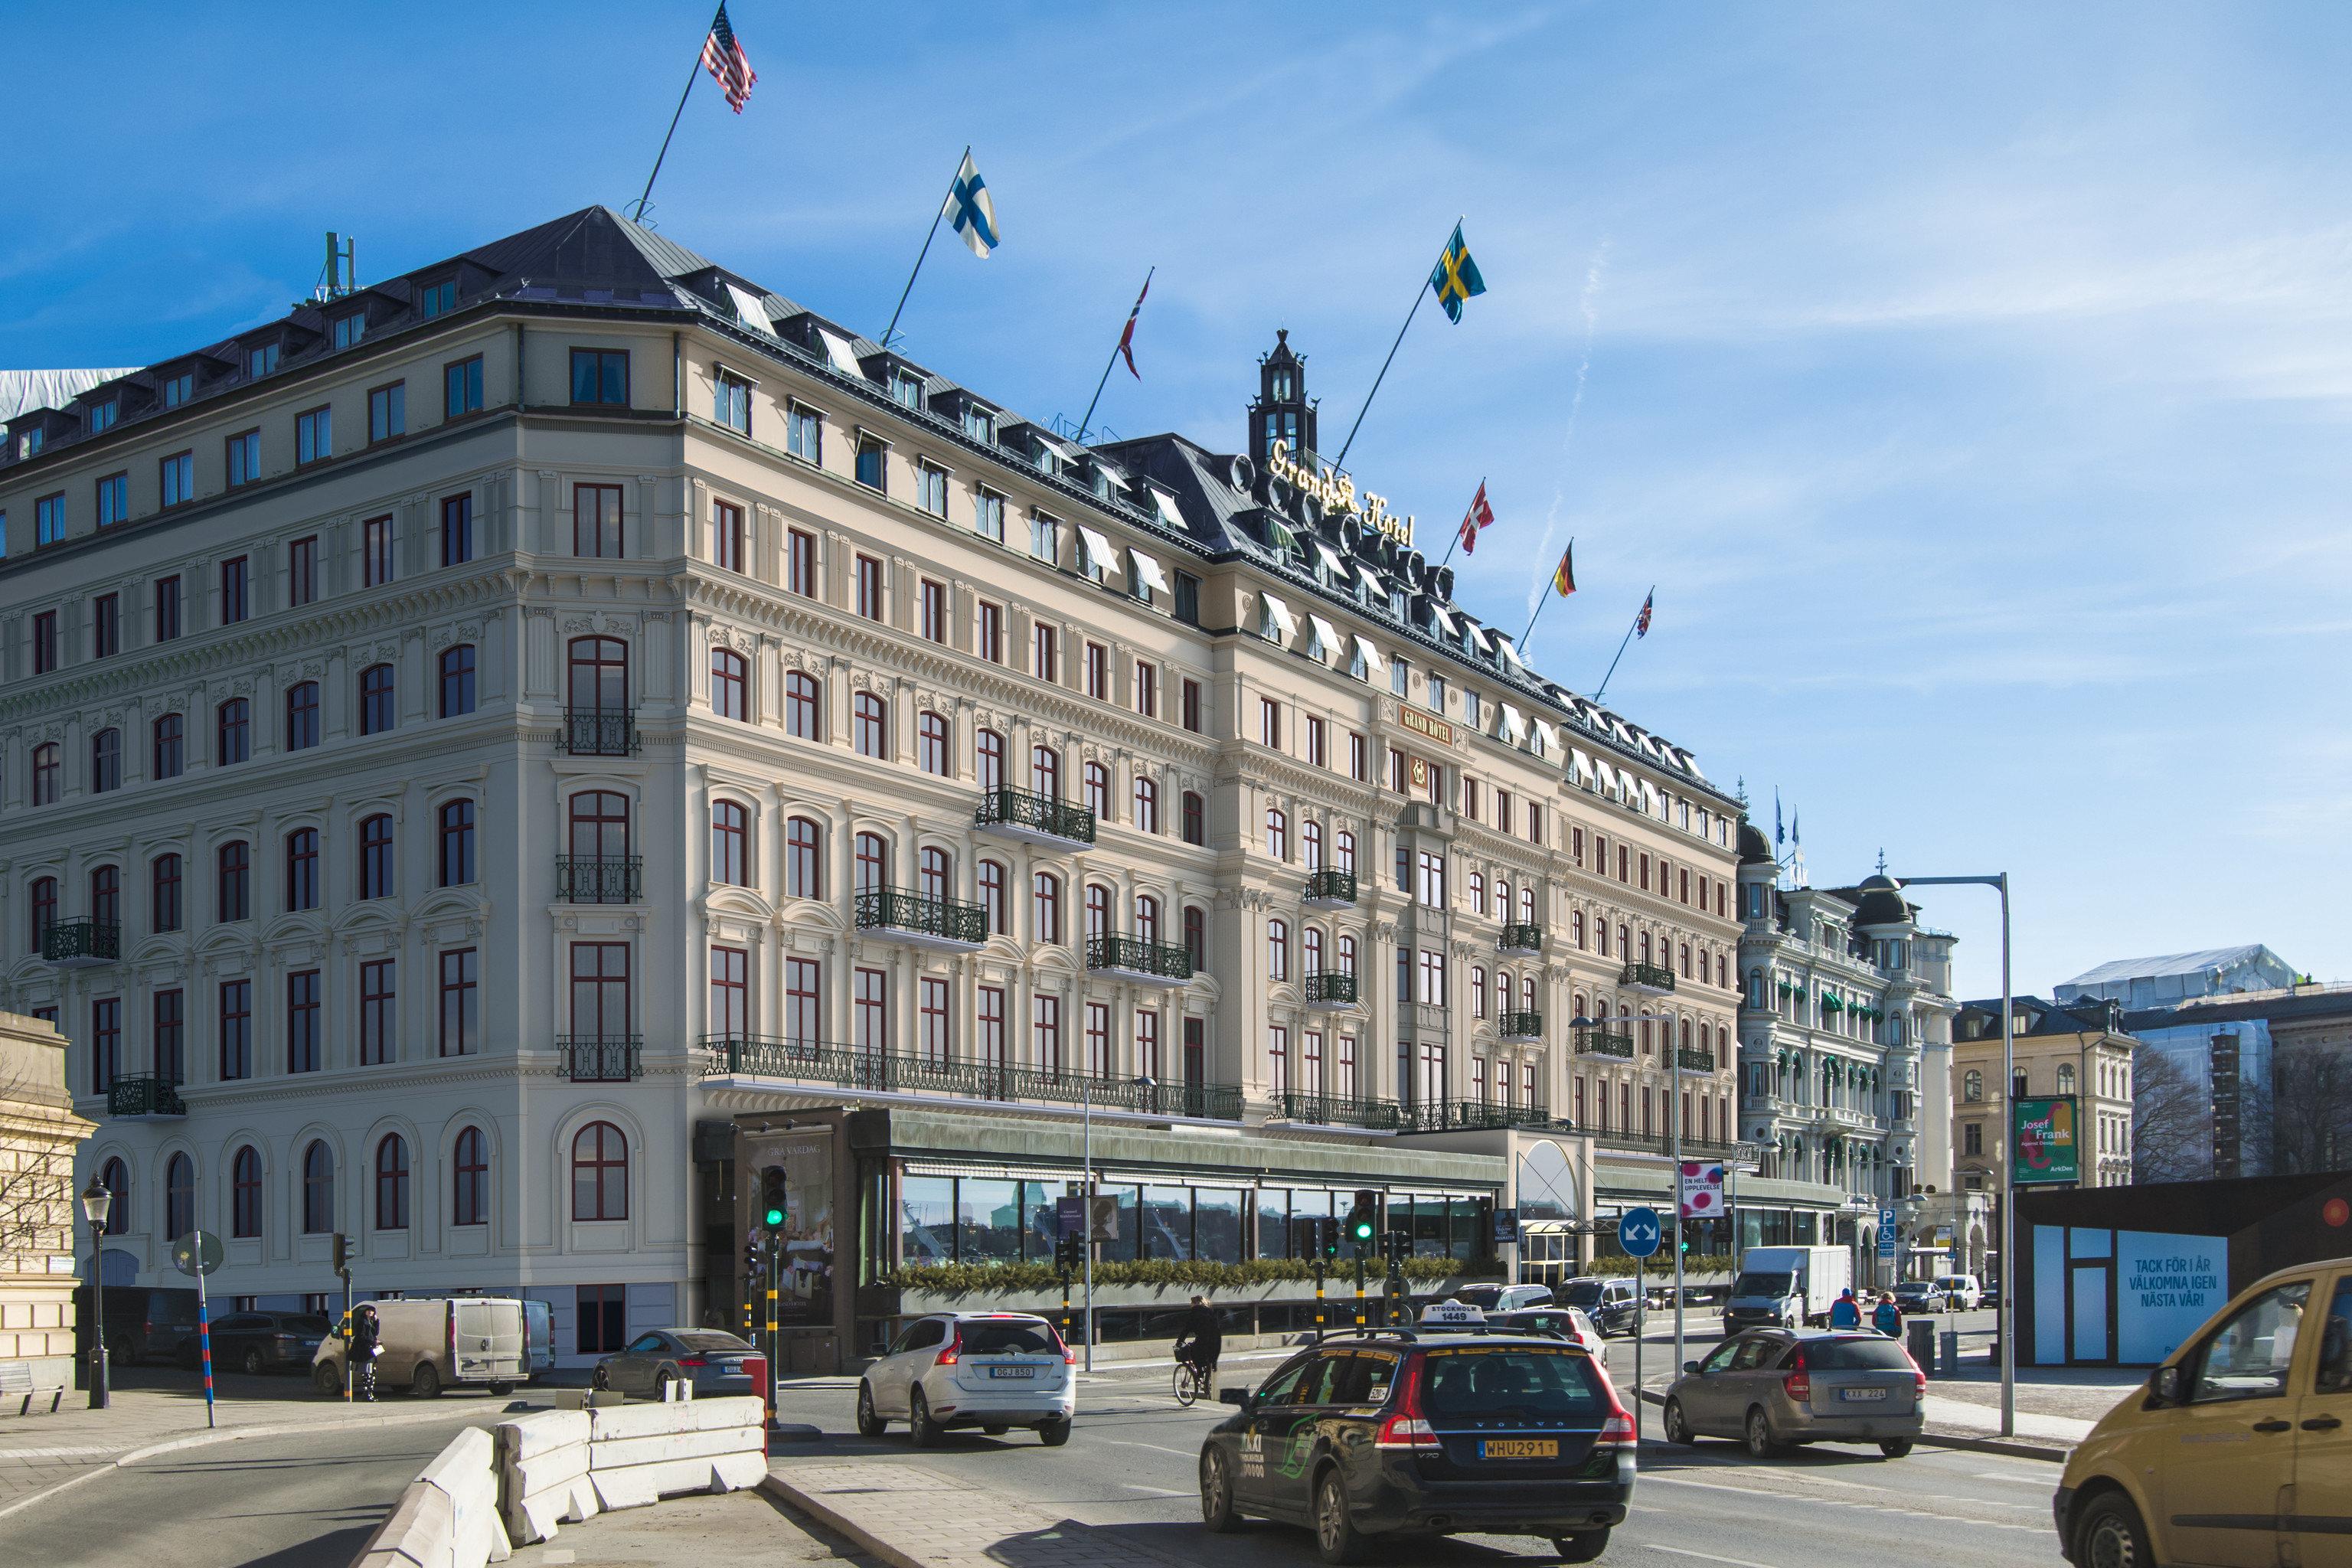 Hotels Stockholm Sweden Outdoor Building Sky Road Street City Landmark Town Urban Area Metropolis Metropolitan